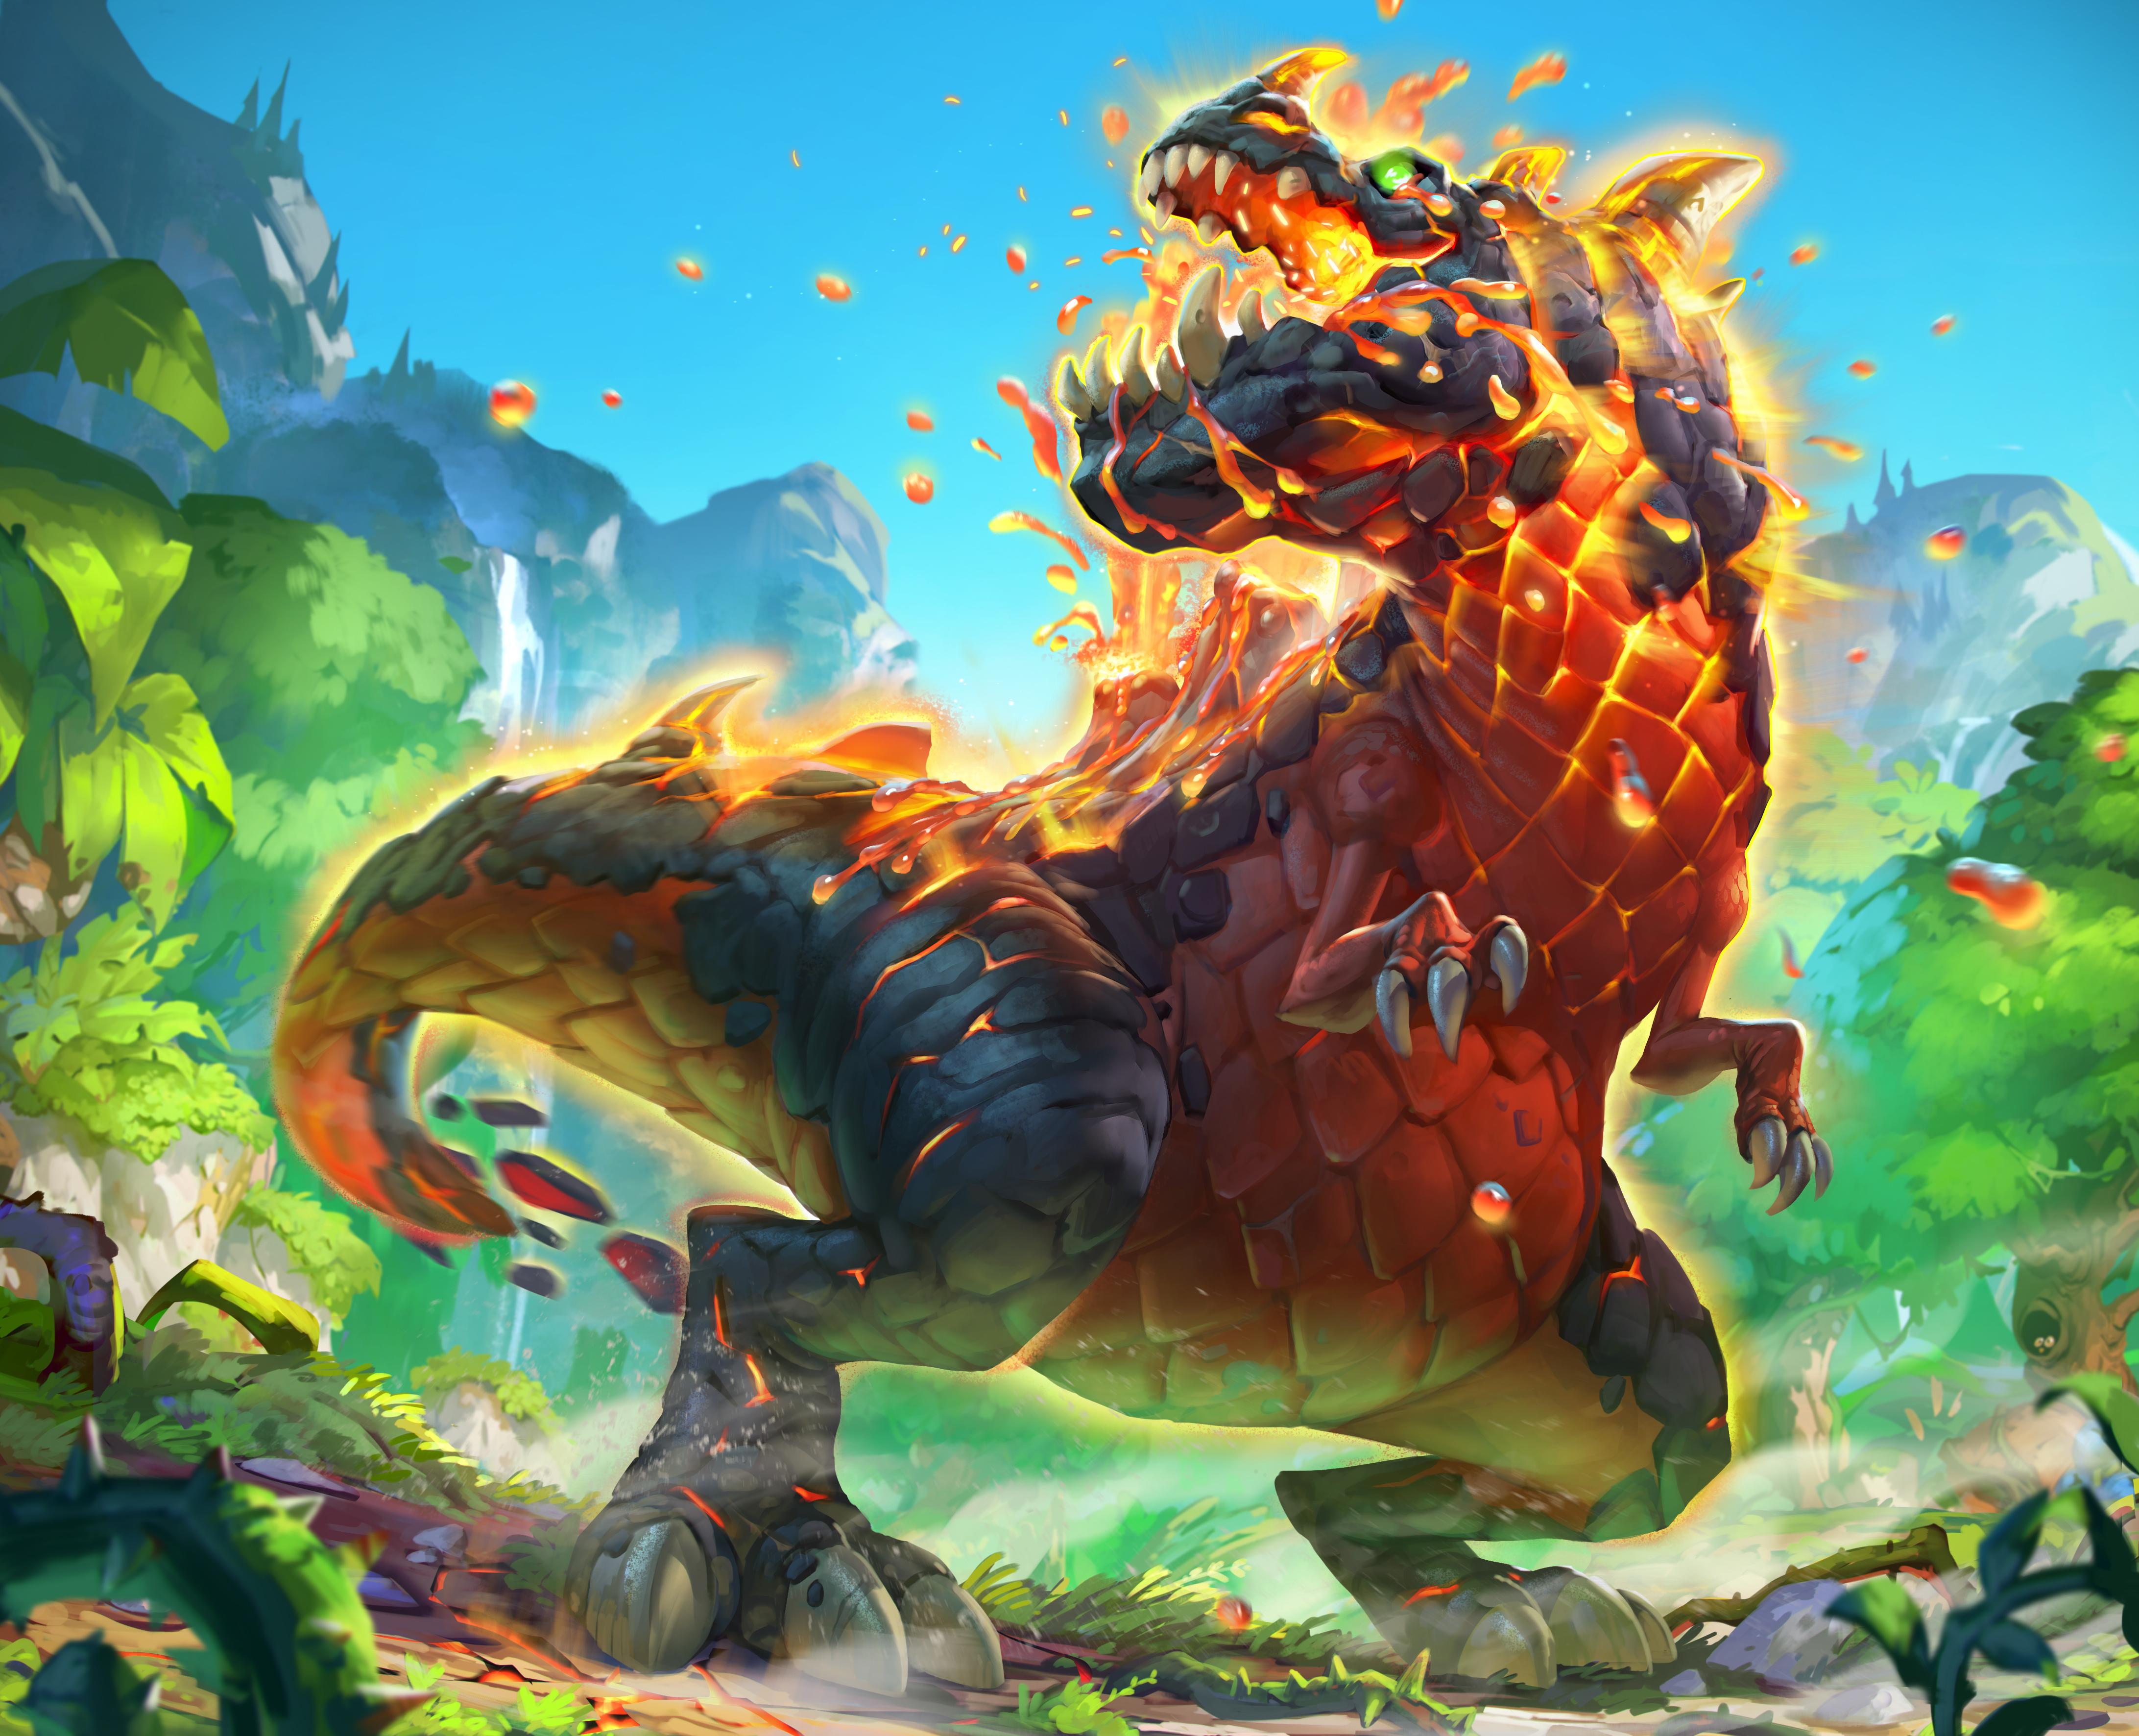 hearthstone warcraft heroes dinosaur volcanic rudy fantasy fire might fondo siswanto pantalla backgrounds concept ic desktop creature artwork arte 4k